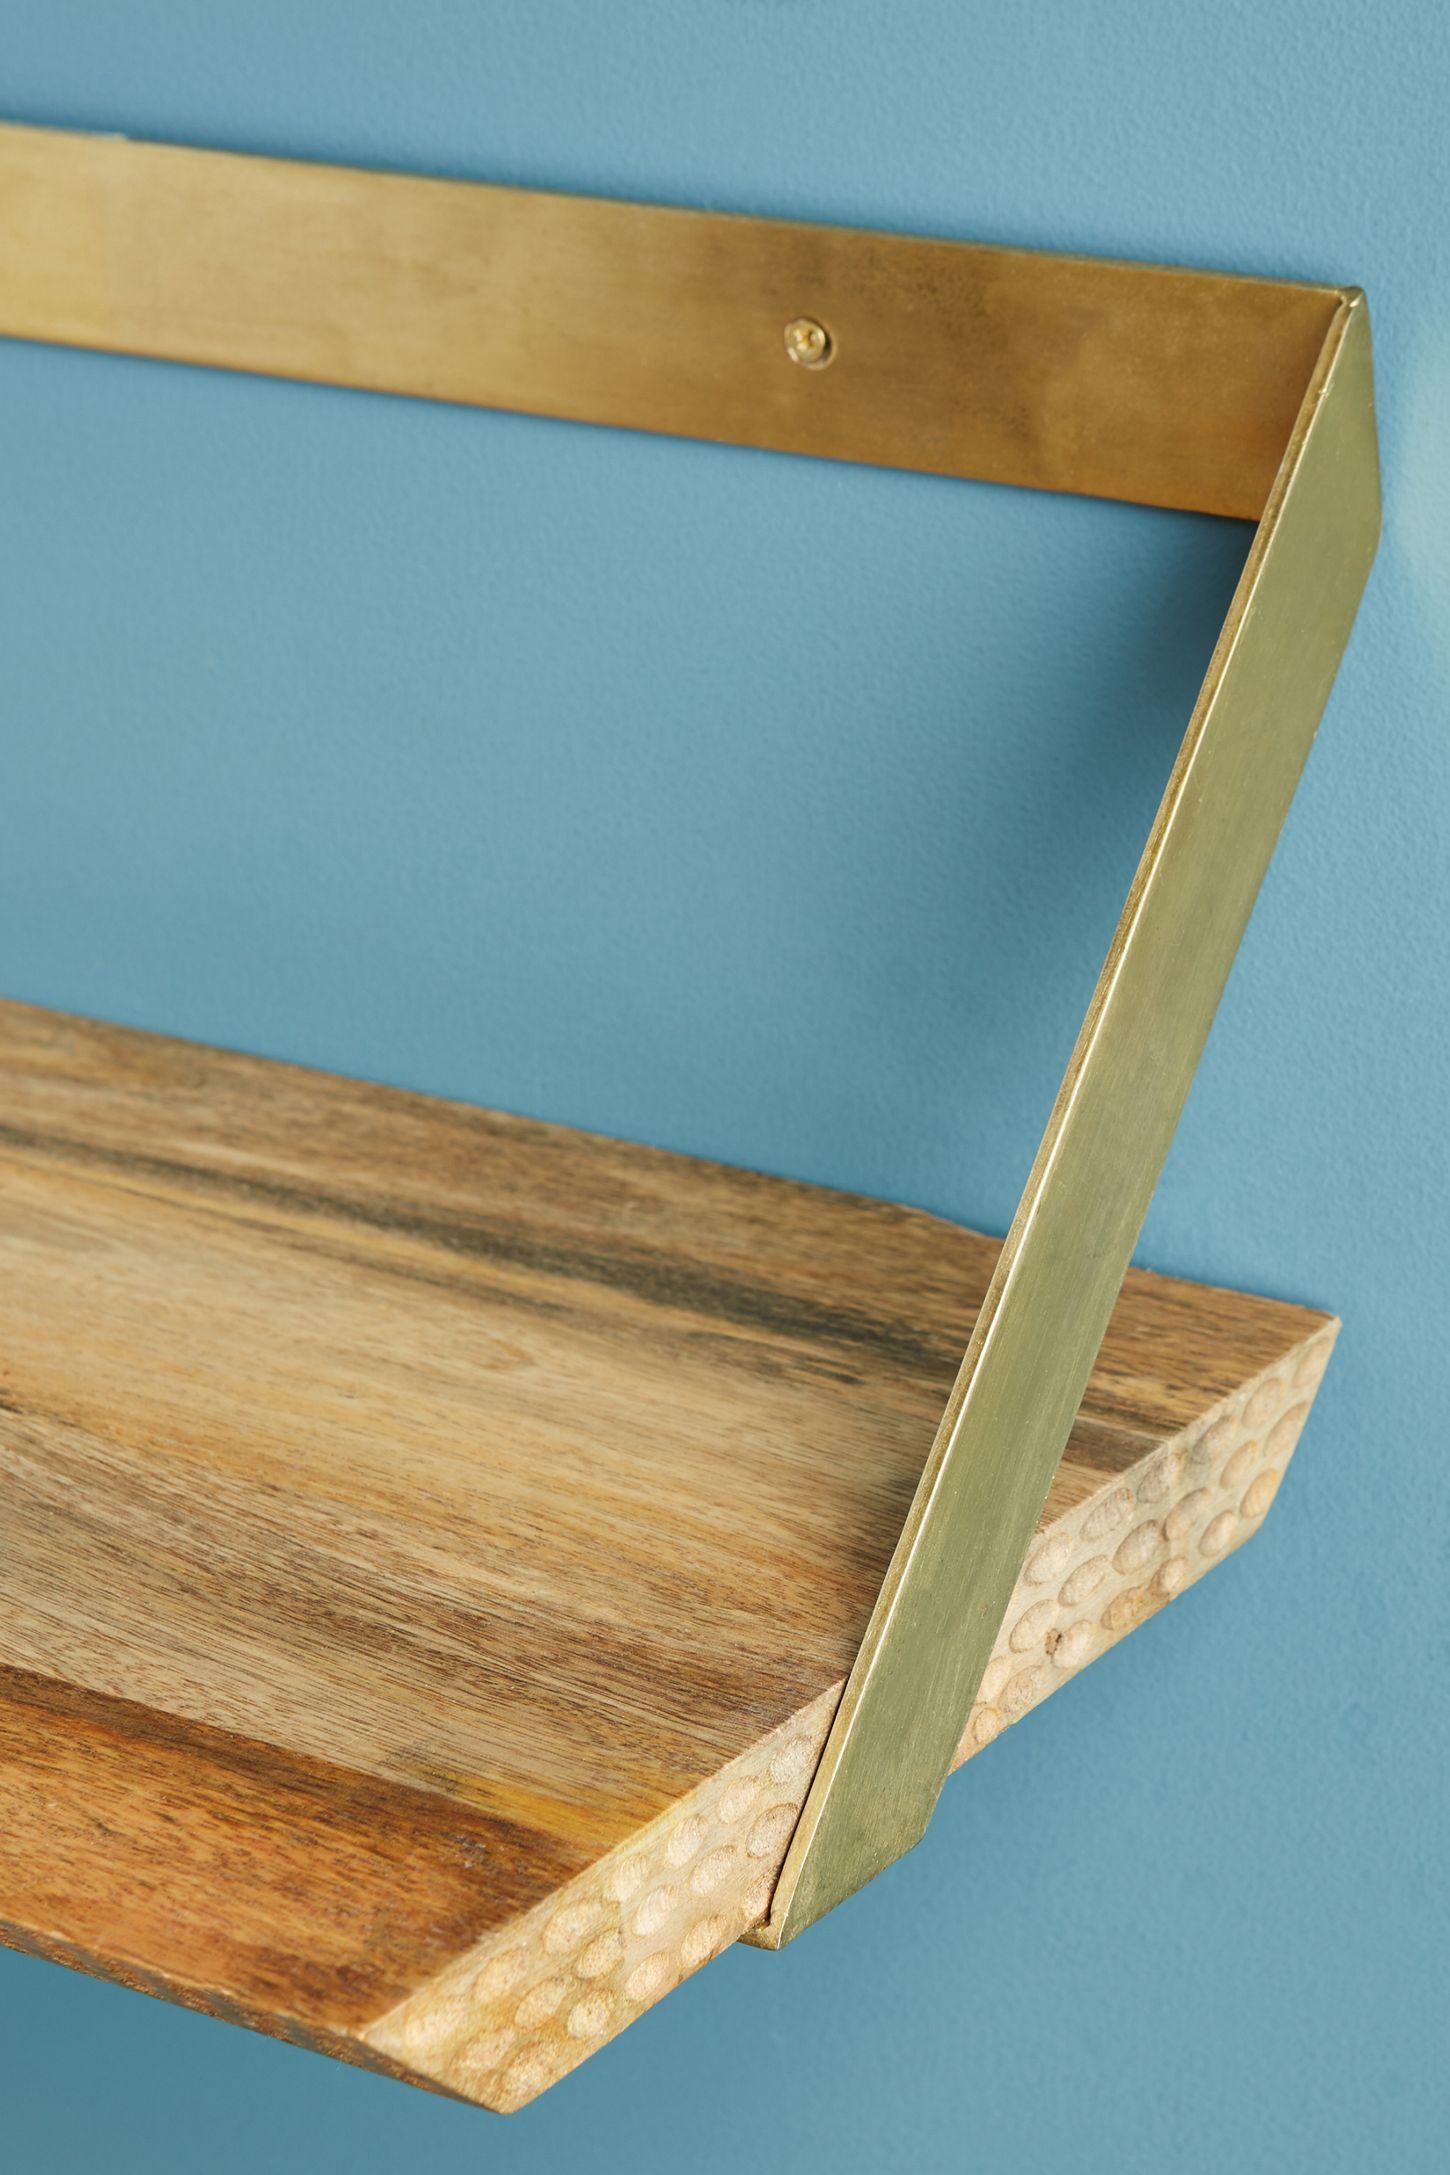 Beveled Wood Shelf | Wood shelf, Shelves and Woods